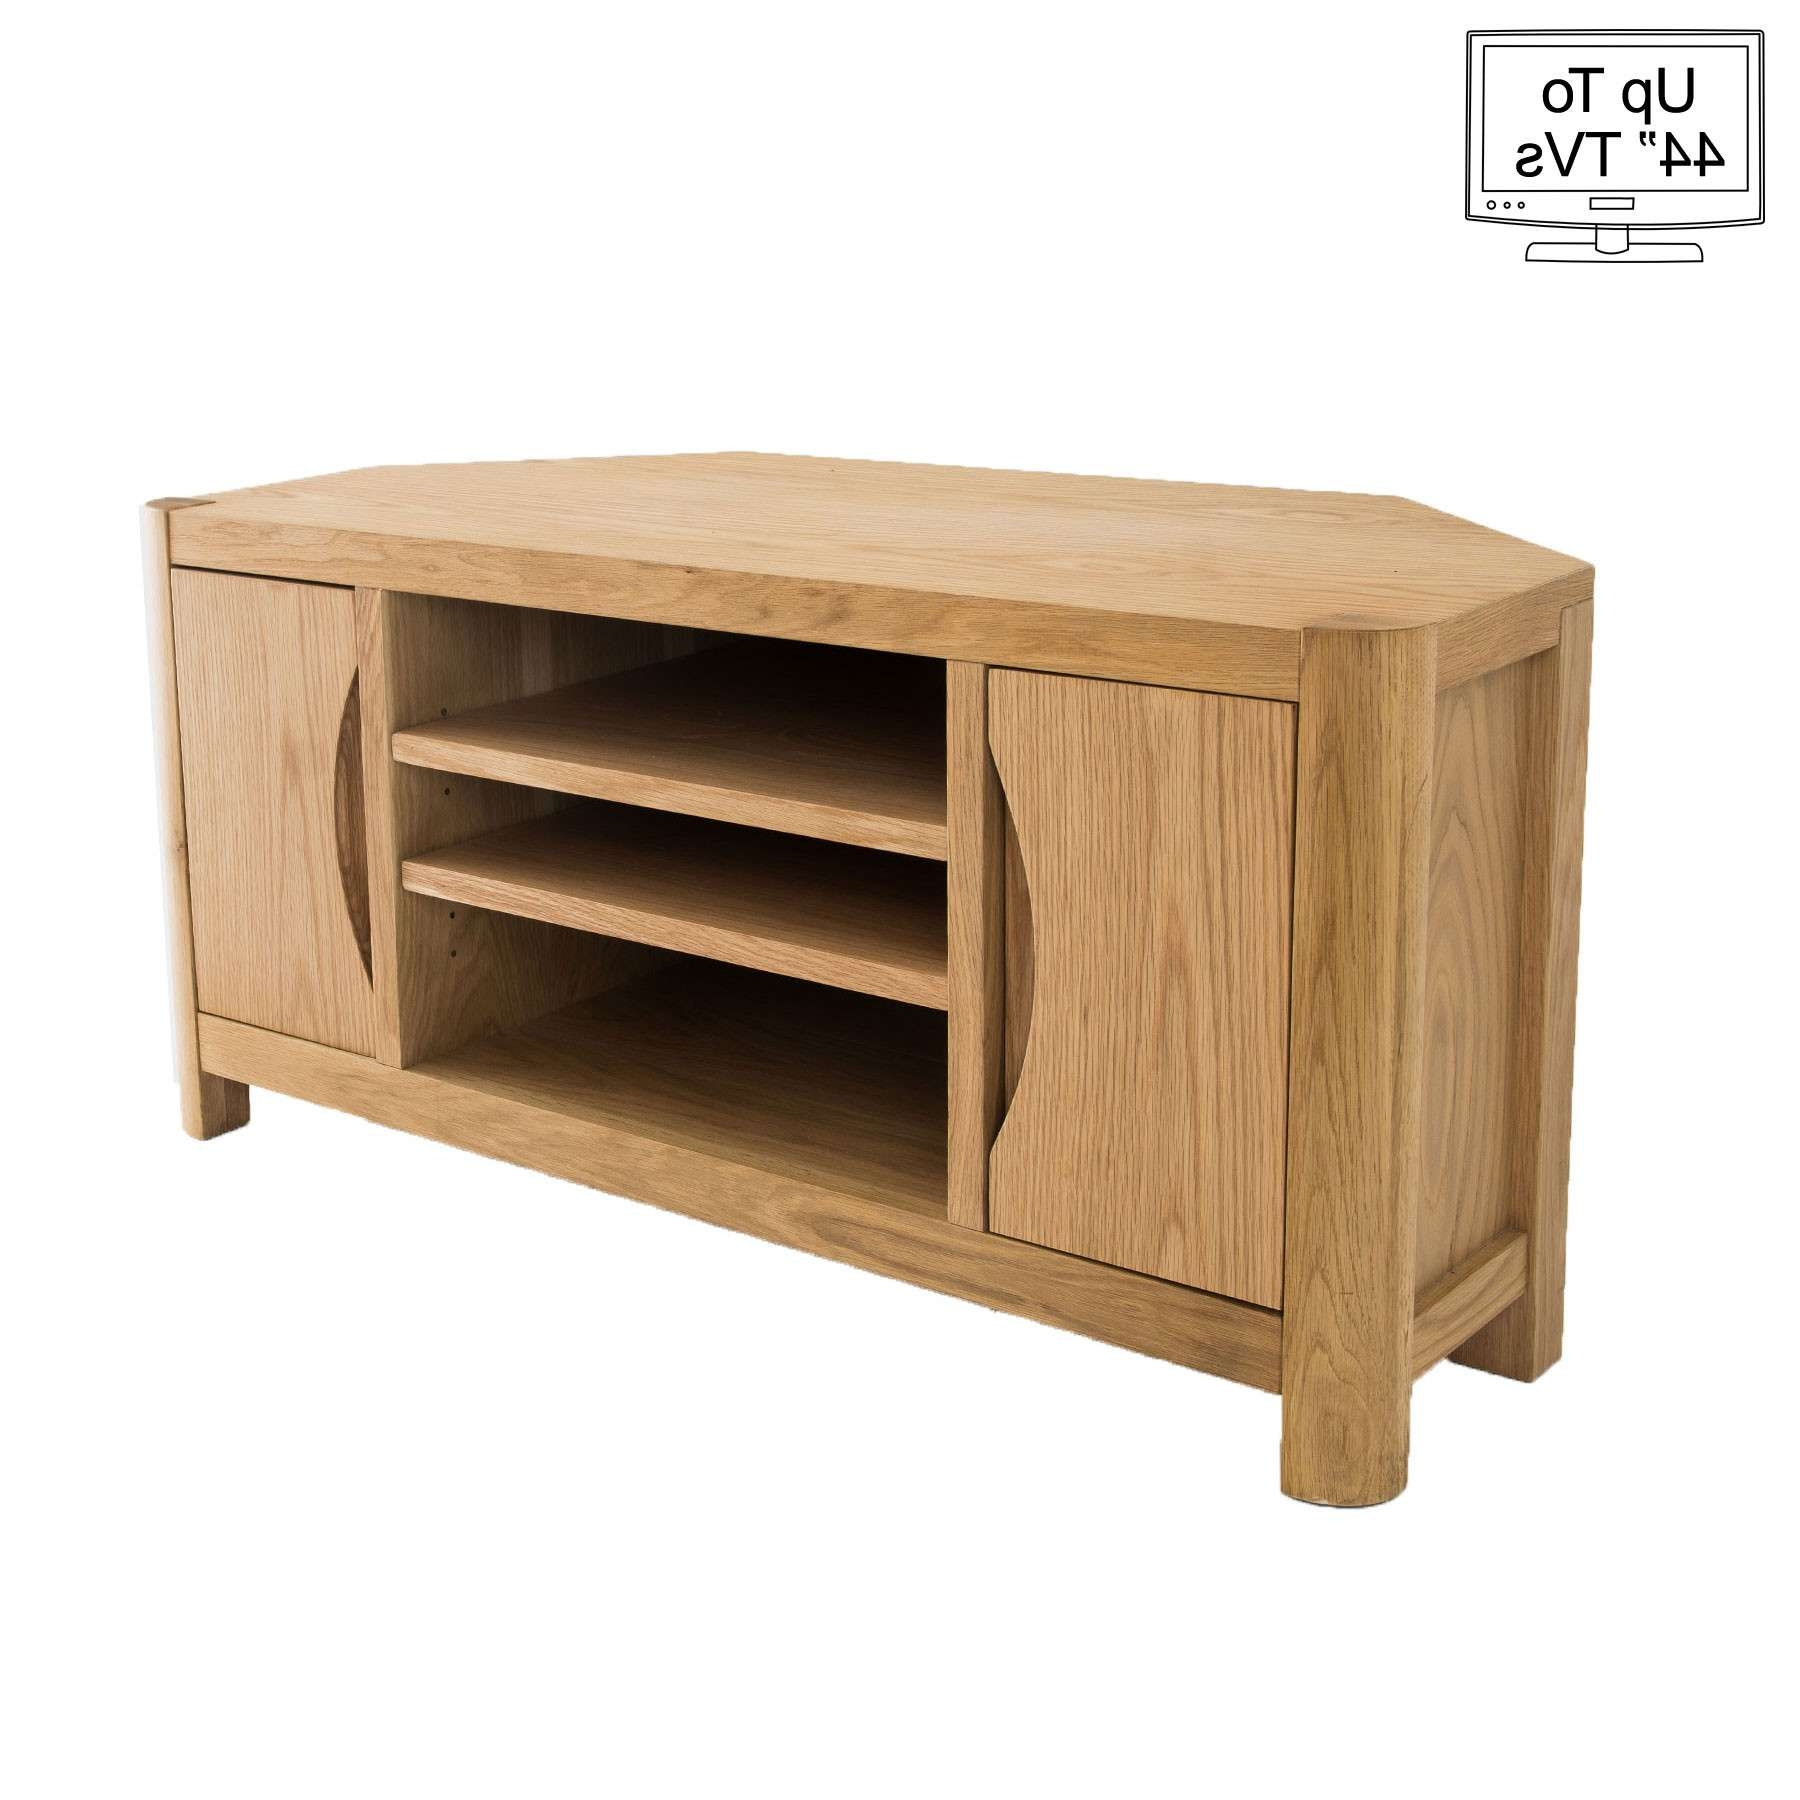 "Light Oak Corner Tv Stand For Up To 44"" Tvs Intended For Light Oak Corner Tv Cabinets (View 7 of 20)"